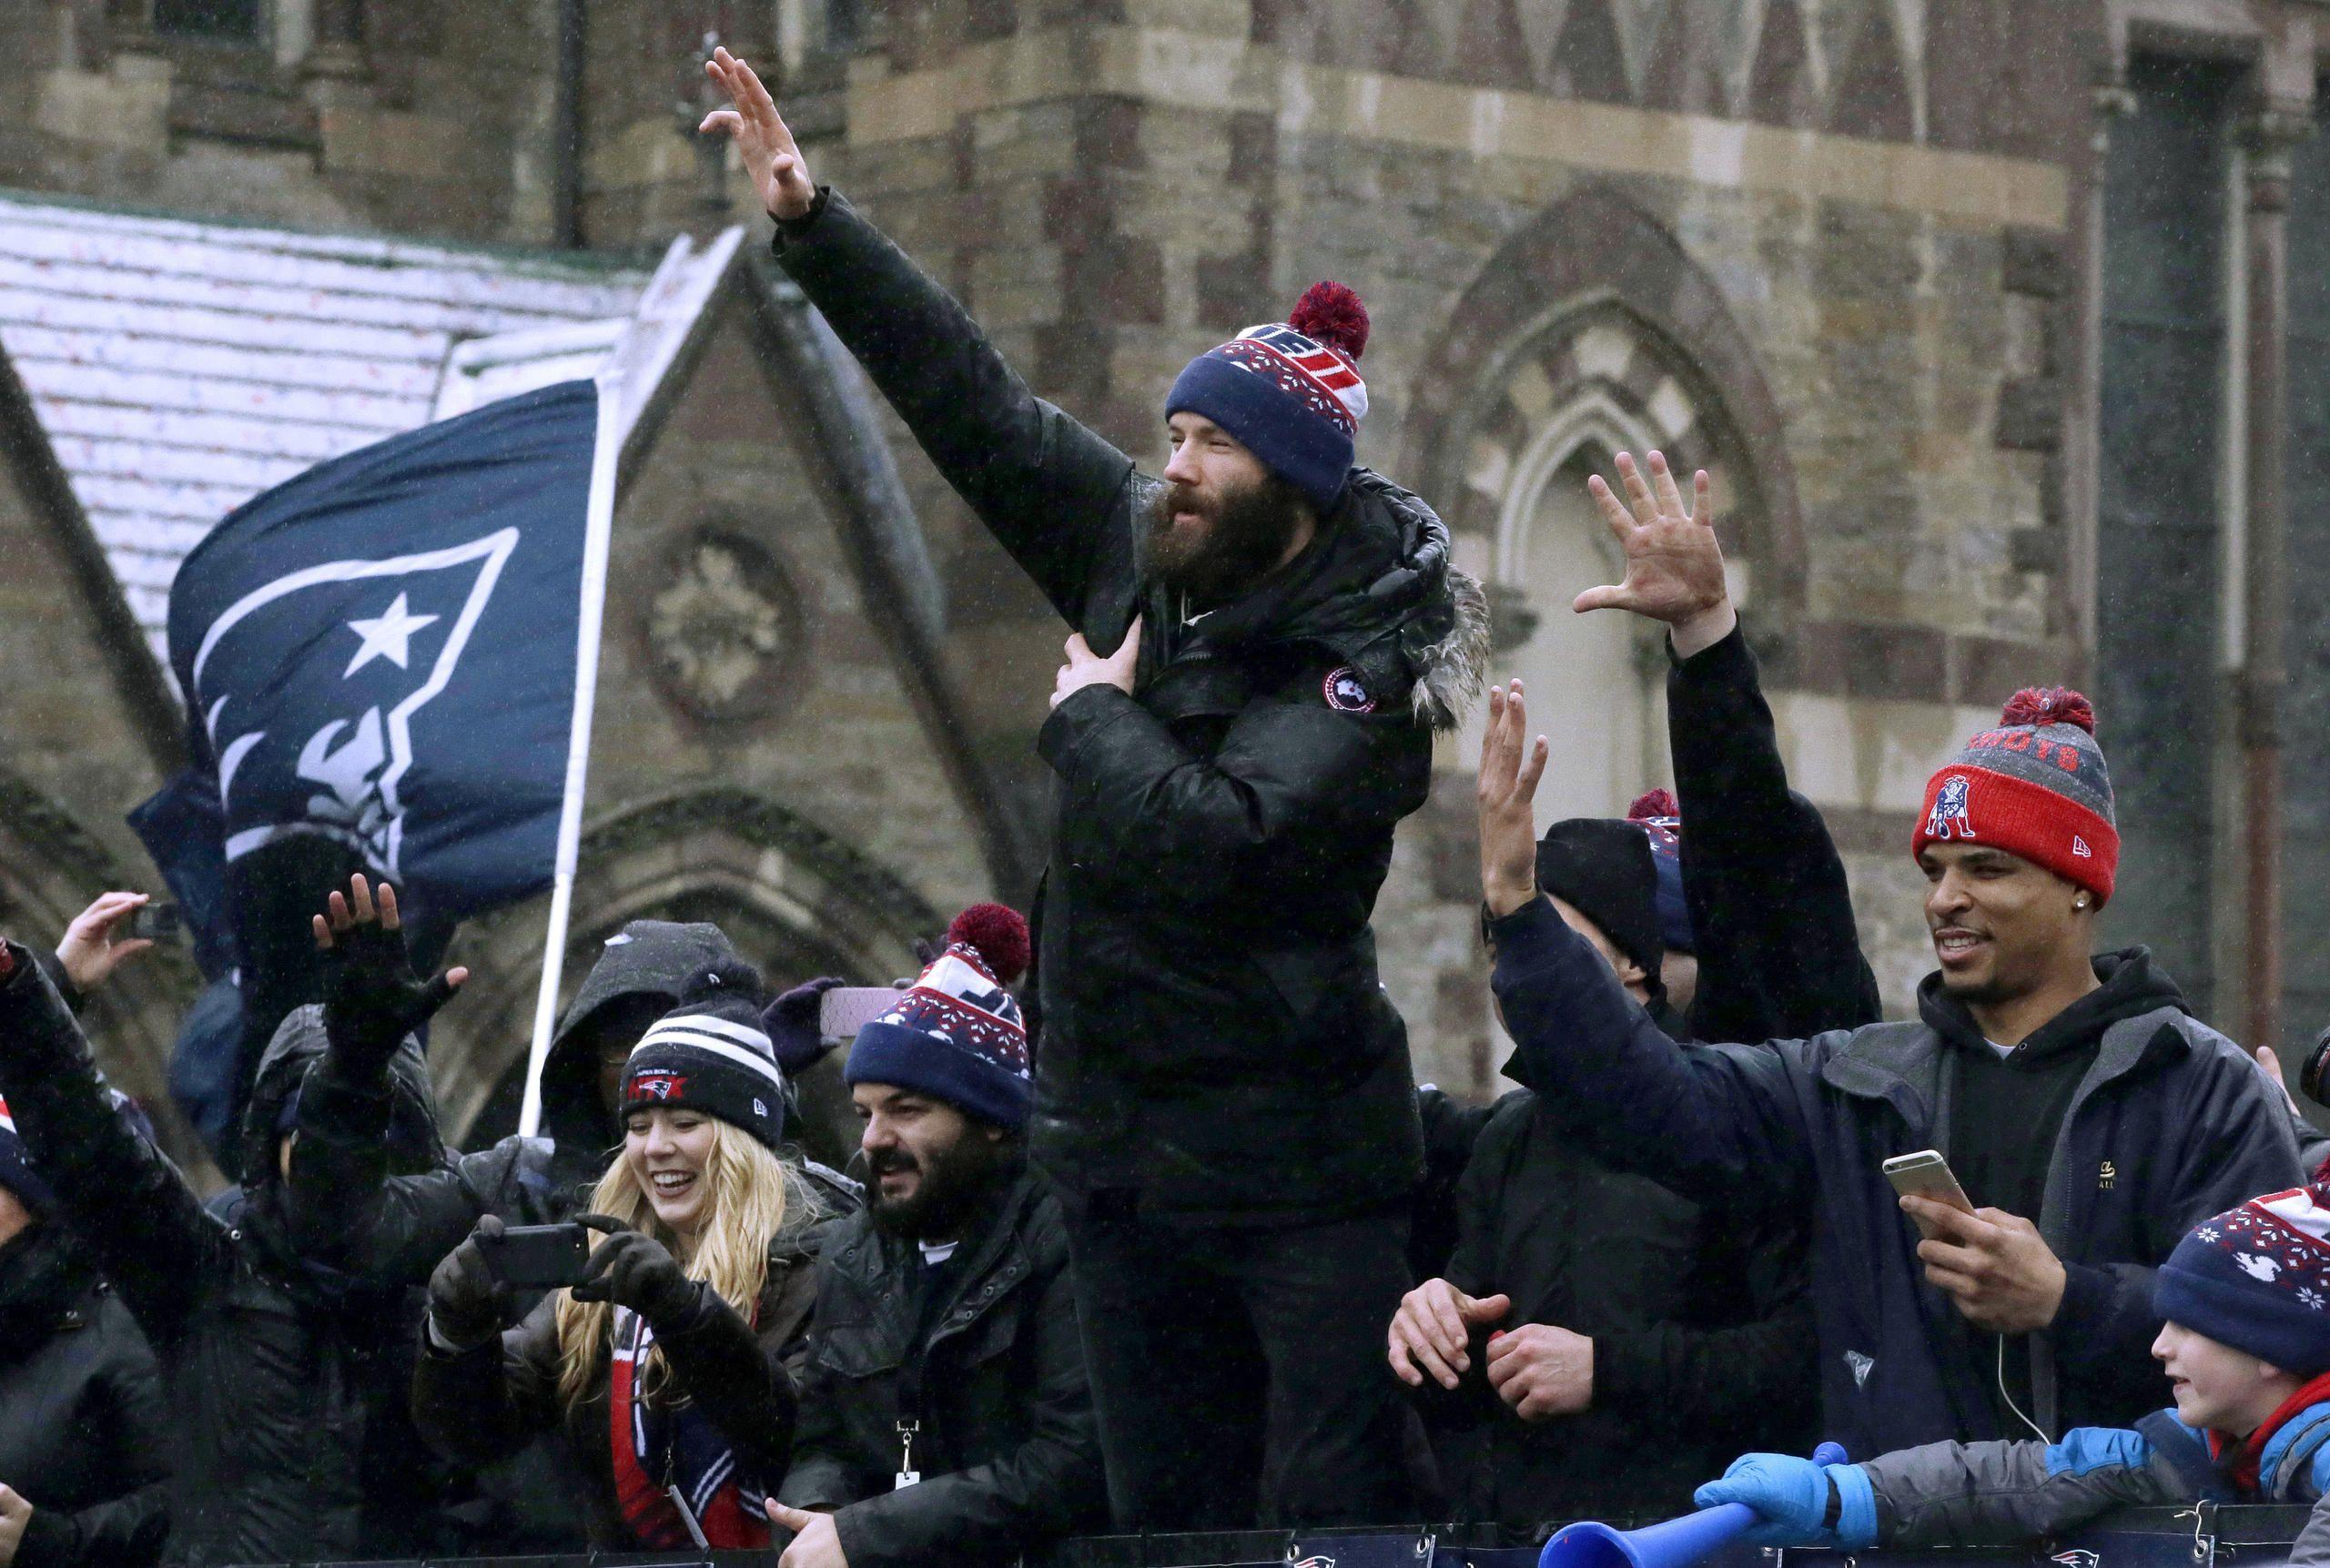 Patriots Super Bowl Li Victory Parade Victory Parade Patriots Super Bowl